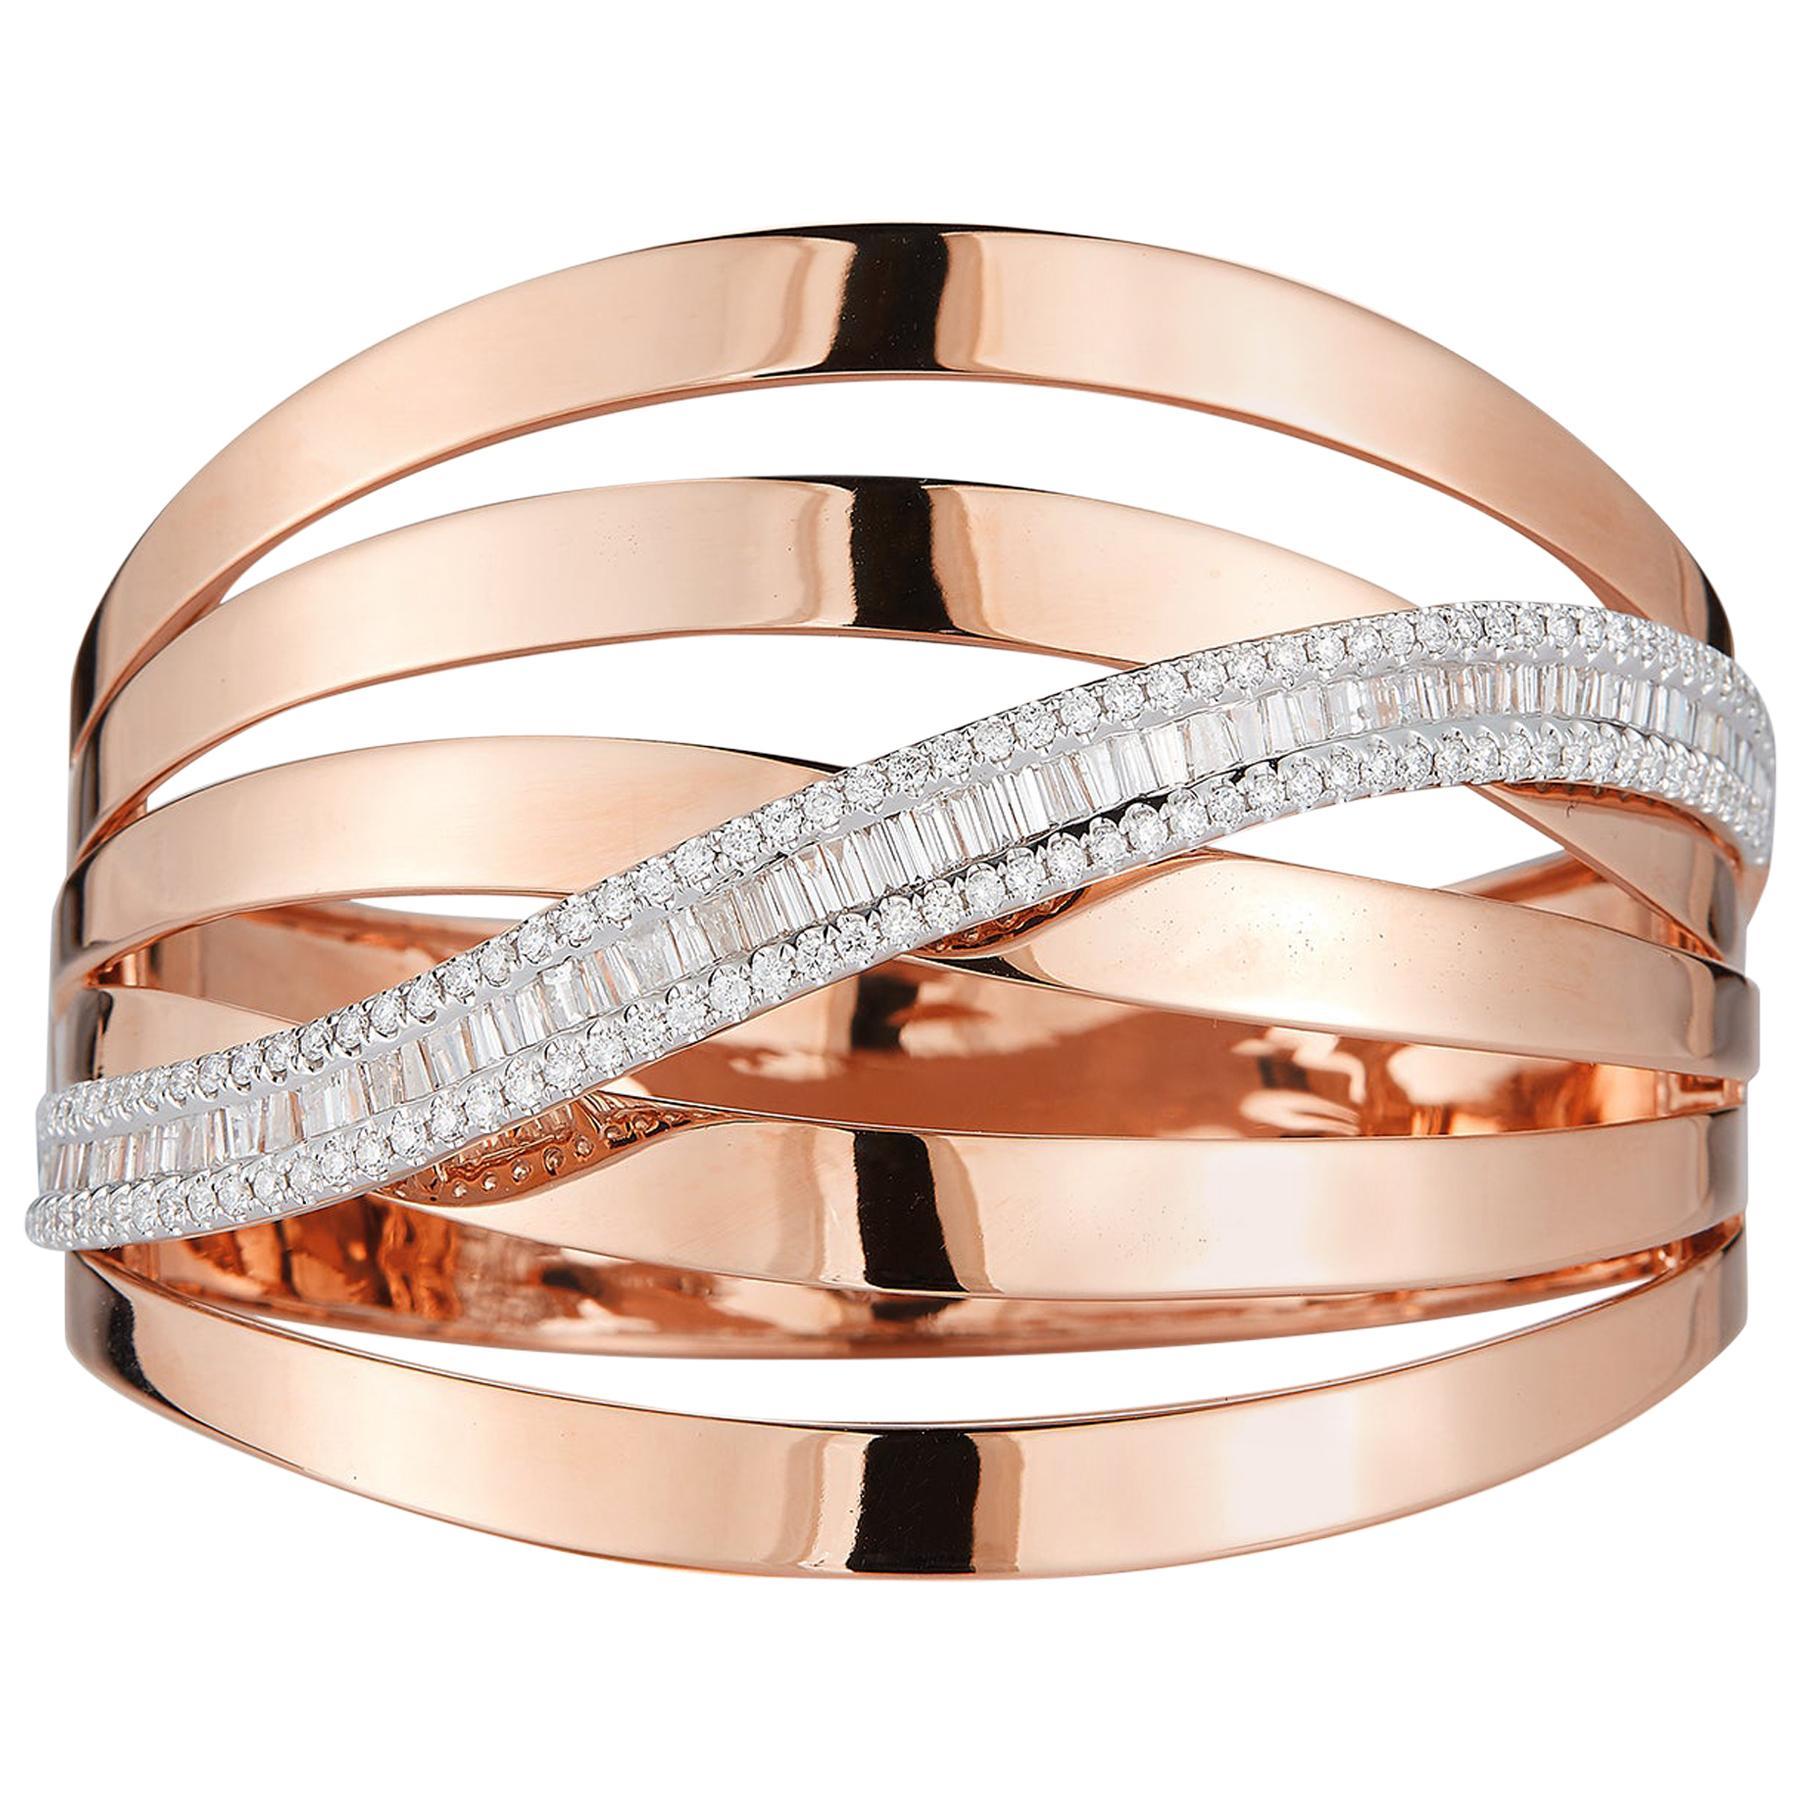 18 Karat Pink Gold and Diamond Bangle-Cuff Bracelet